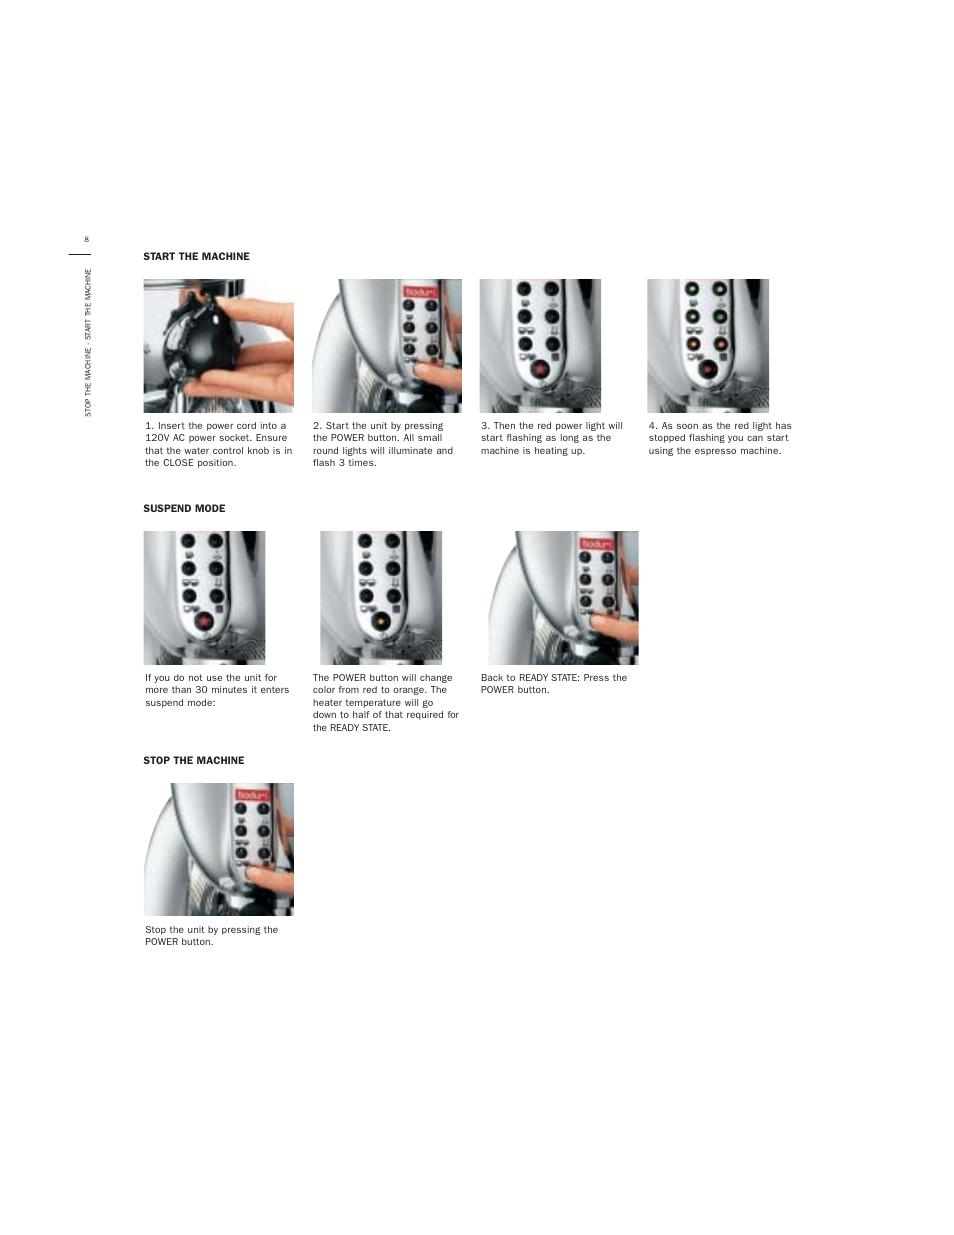 bodum granos 3020 user manual page 10 26 rh manualsdir com John Deere 3020 Diesel Craigslist John Deere 3020 History